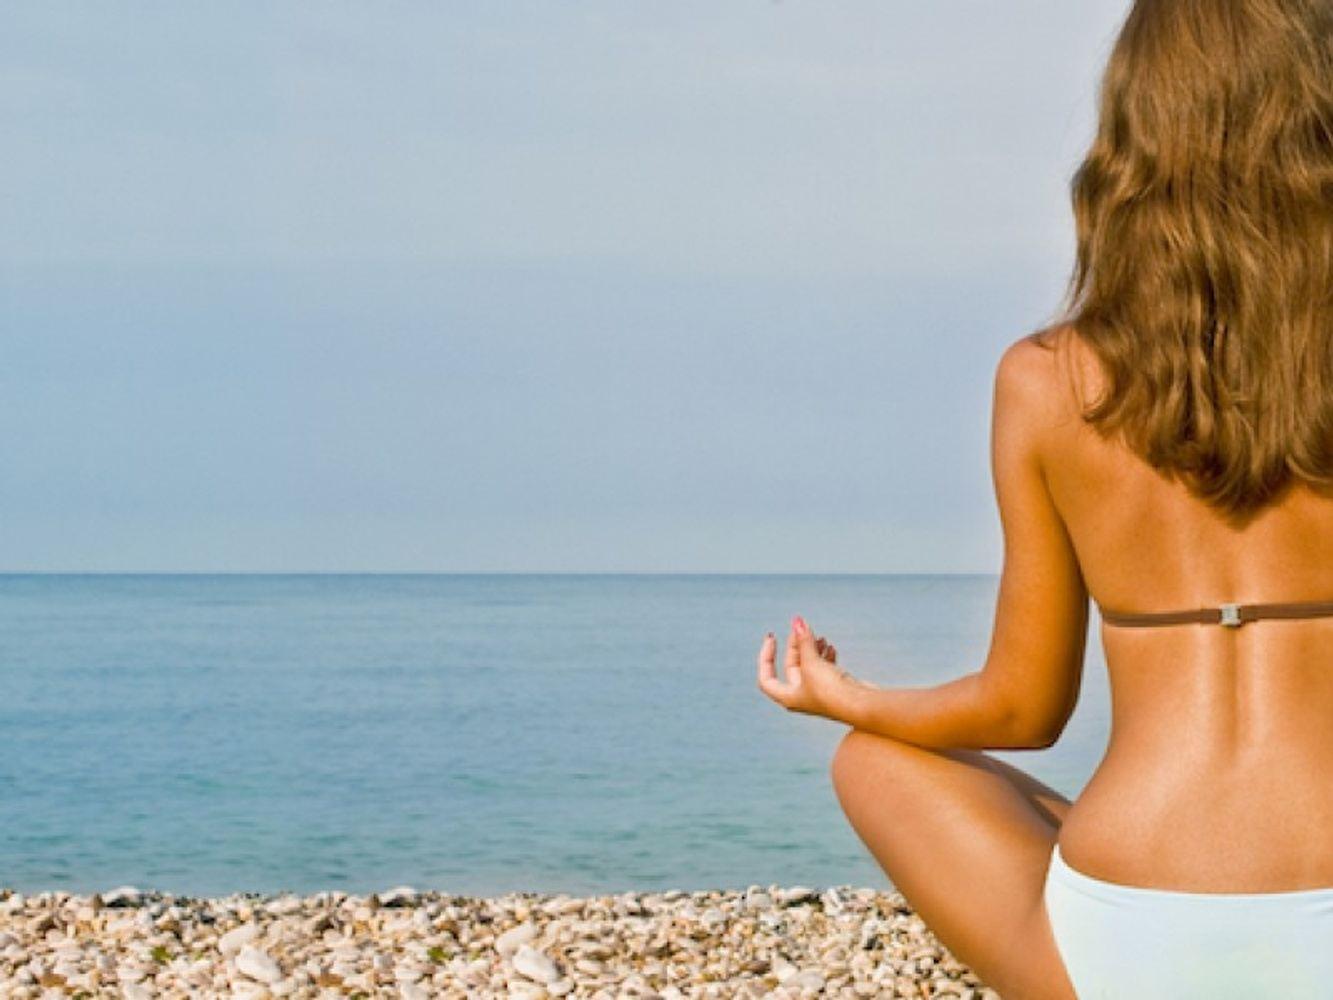 LUXURY YOGA RETREAT IN AJARA FOR HAPPY HEALTHY SEXY WOMEN